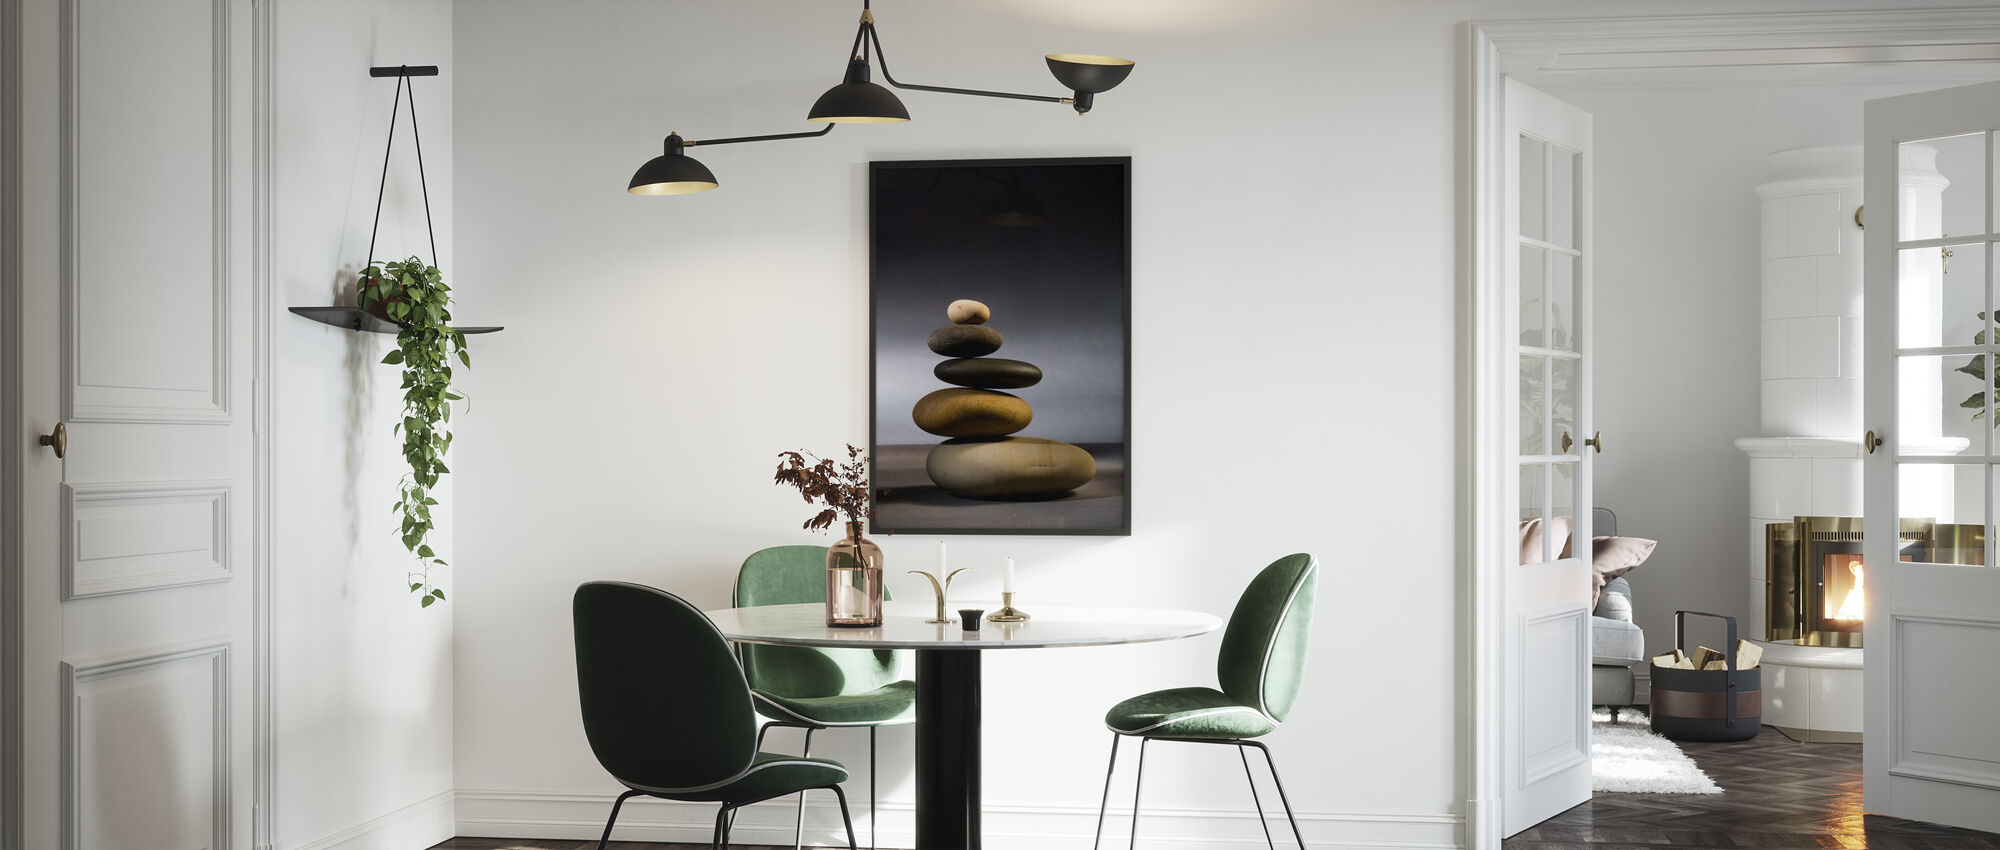 Stones in Zen Balance - Poster - Kitchen